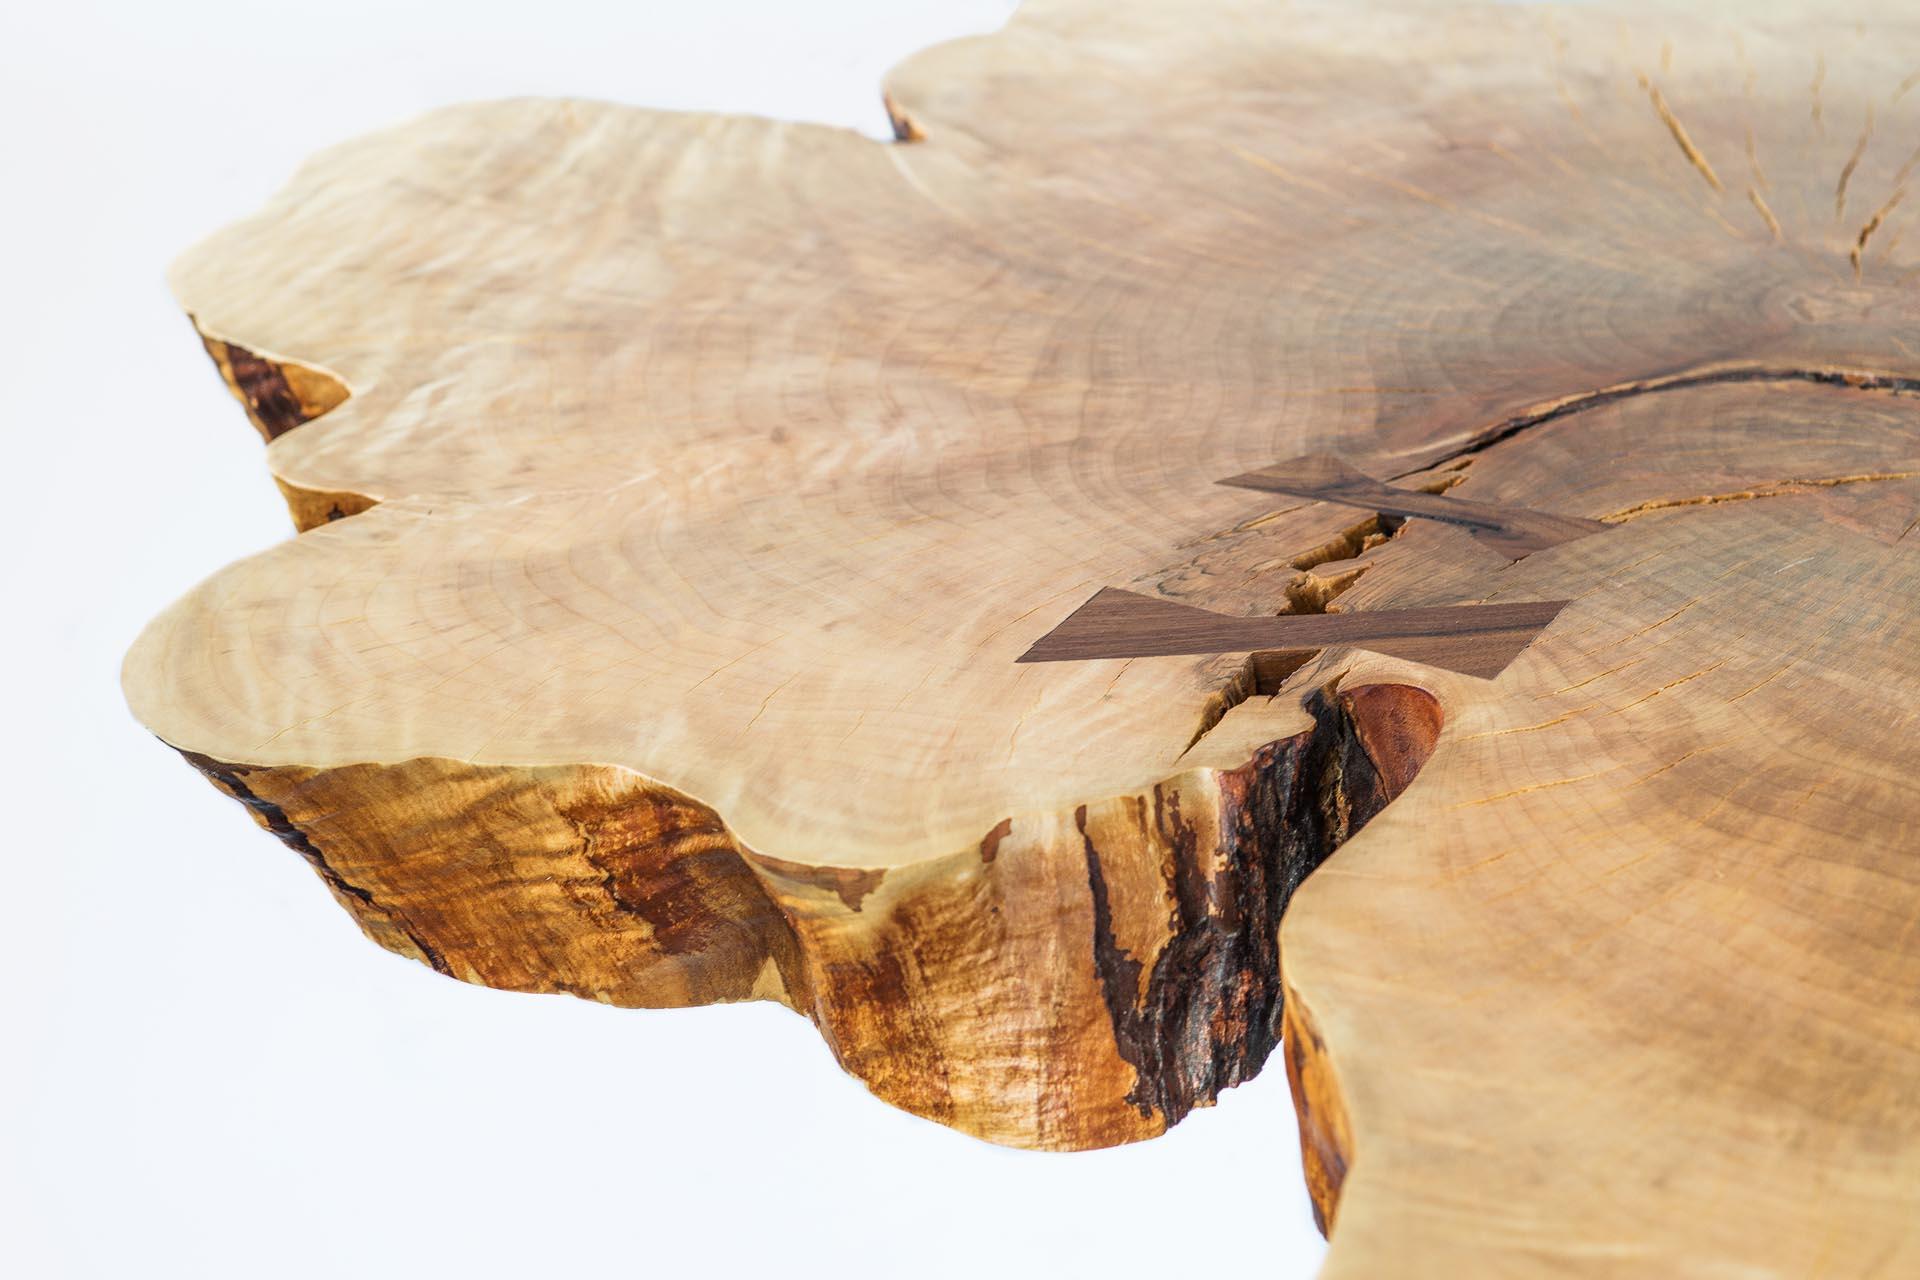 Table-cafe-rondelle-slab-detail-mobilier-montreal